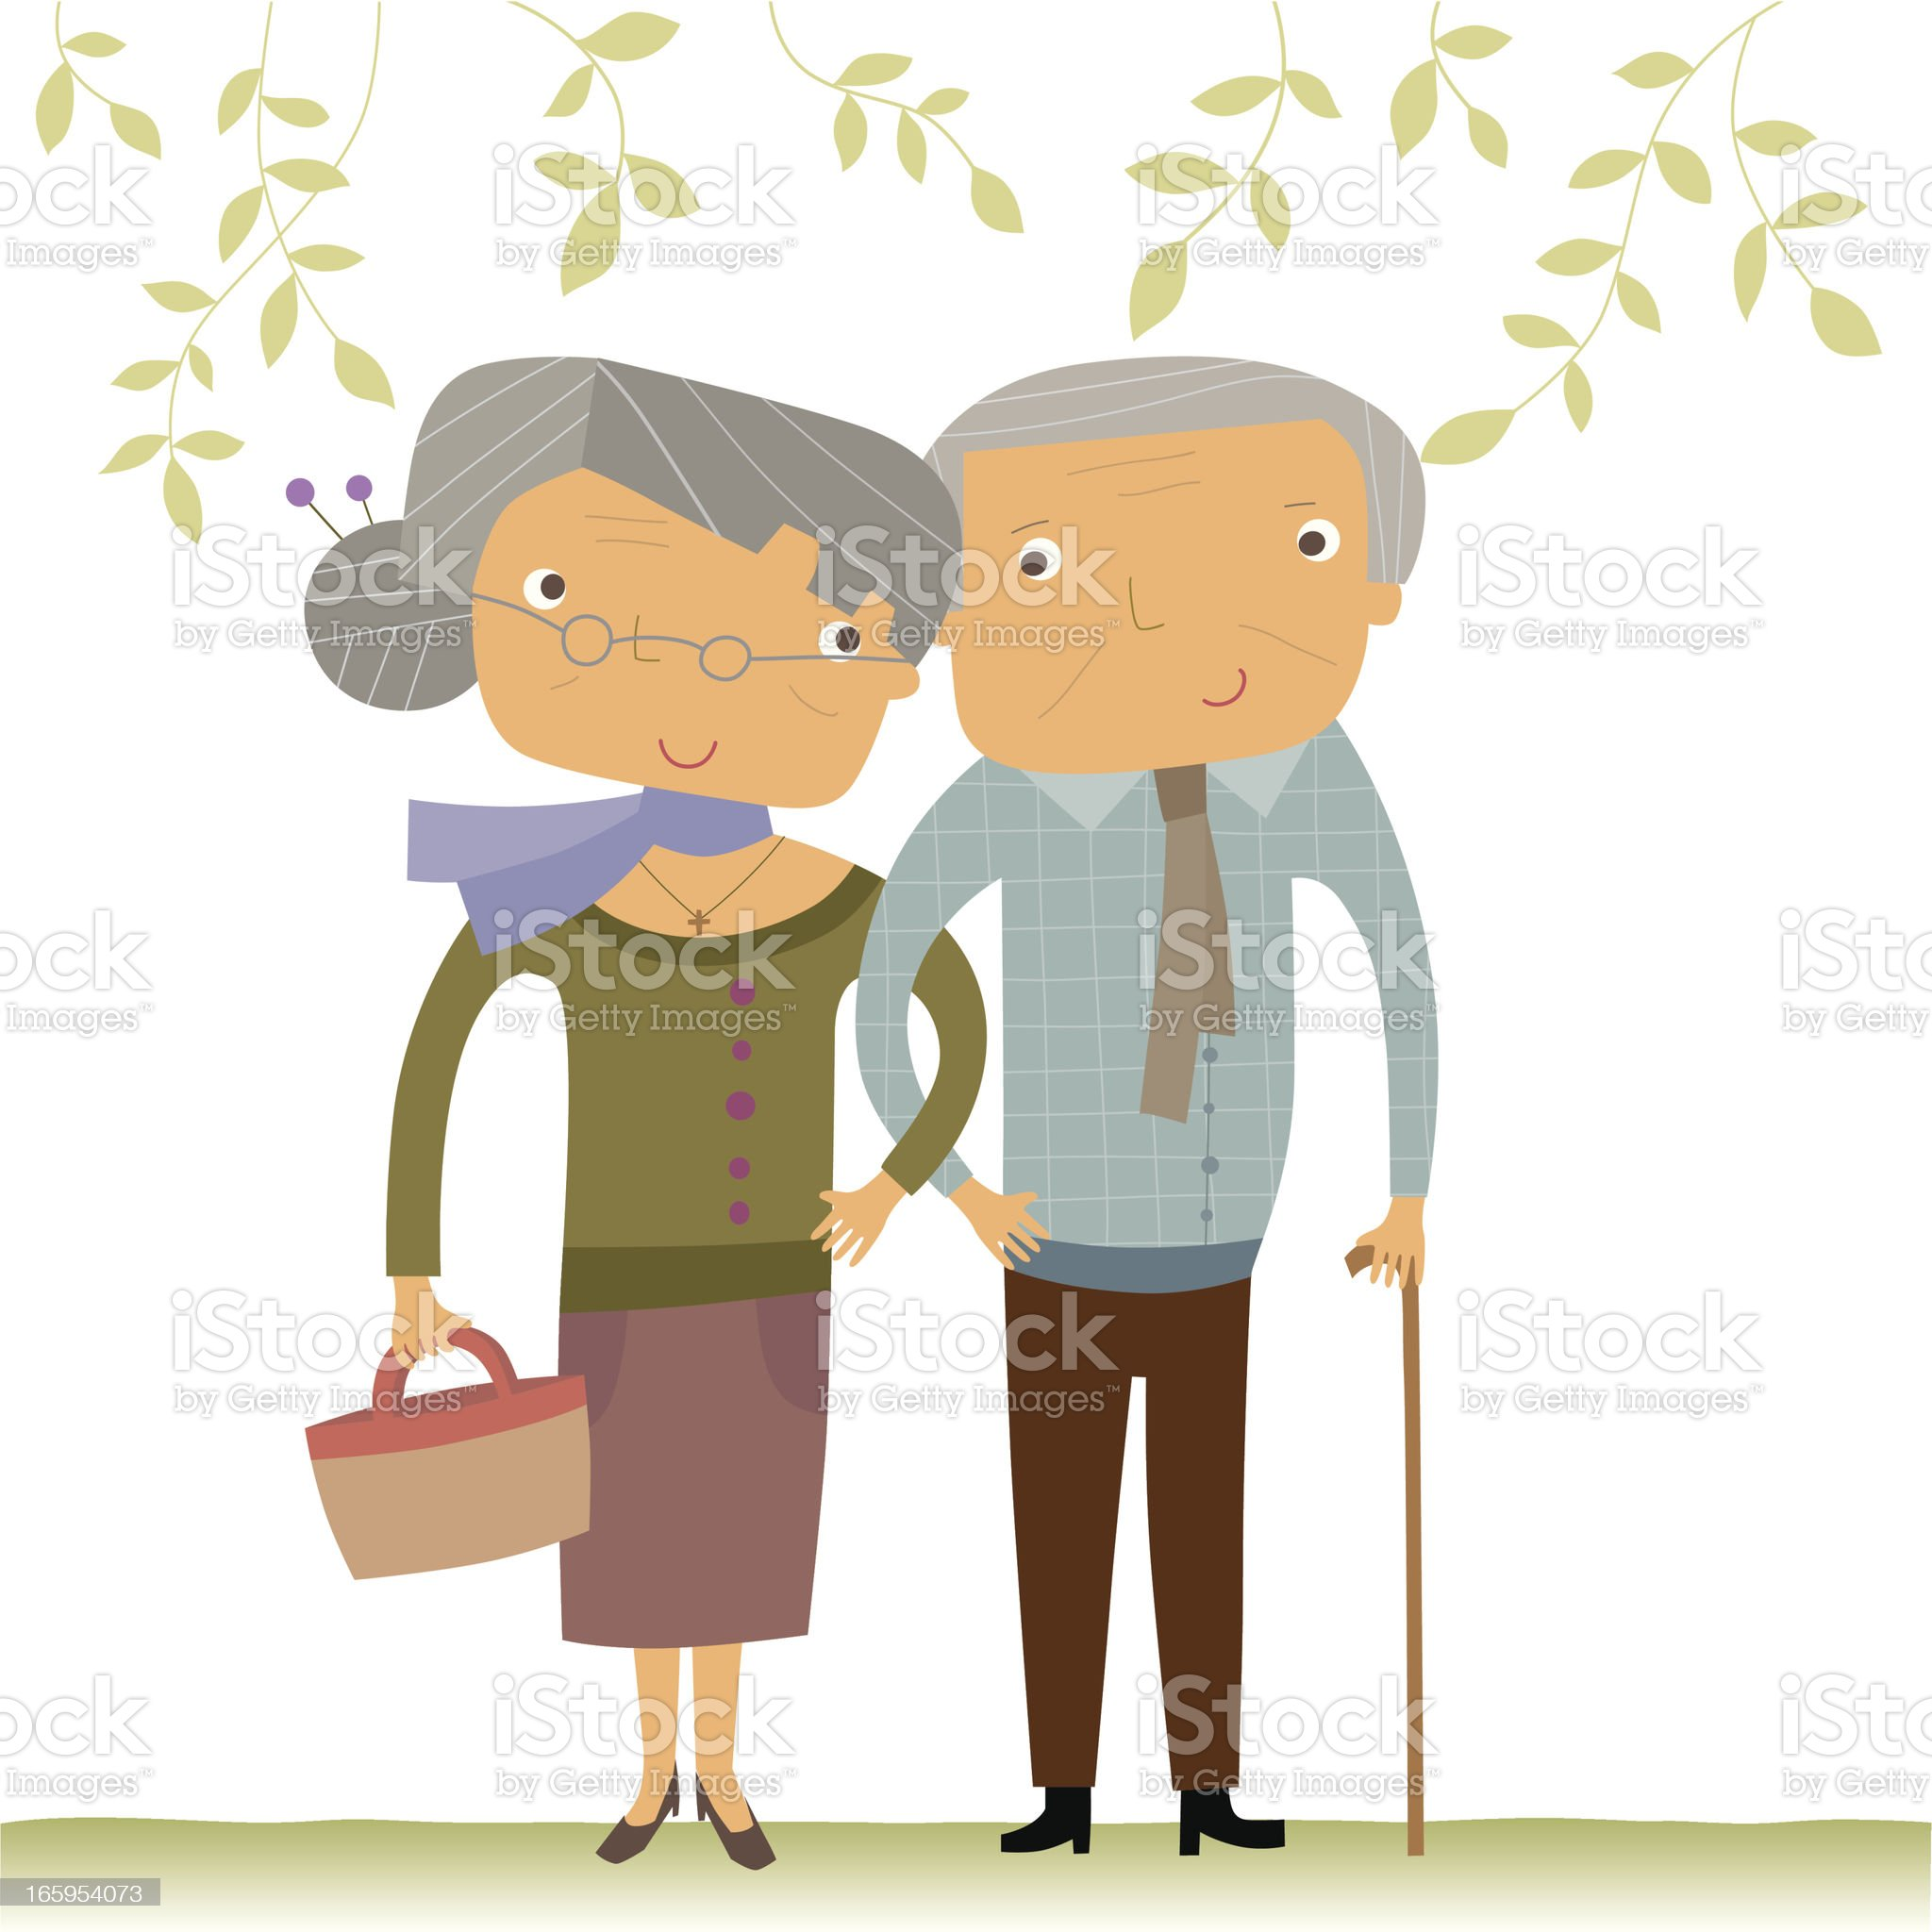 Happy Senior Couple royalty-free stock vector art